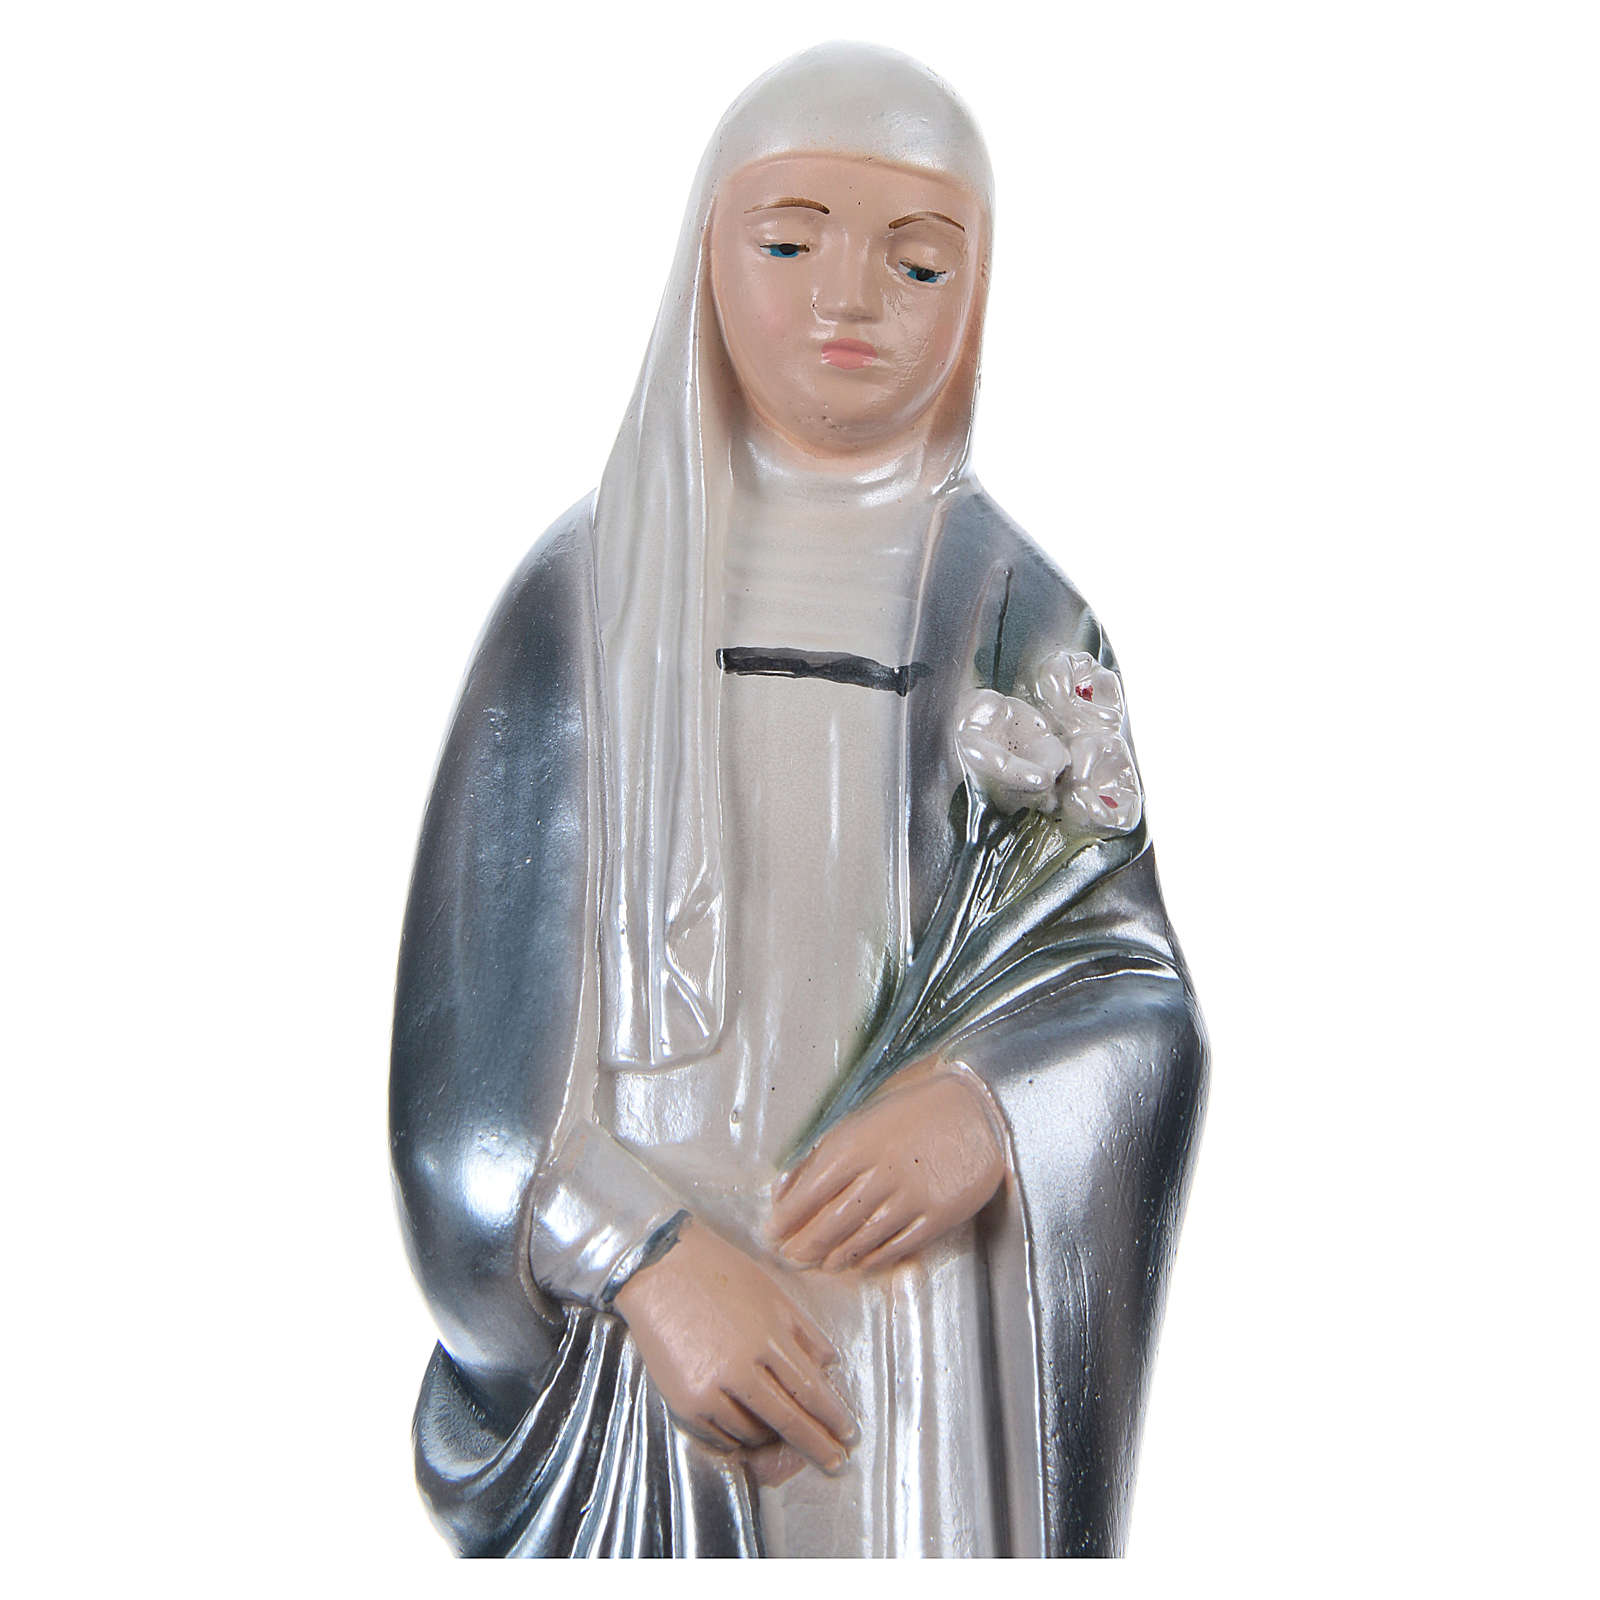 Statua gesso madreperlato Santa Caterina da Siena 20 cm 4